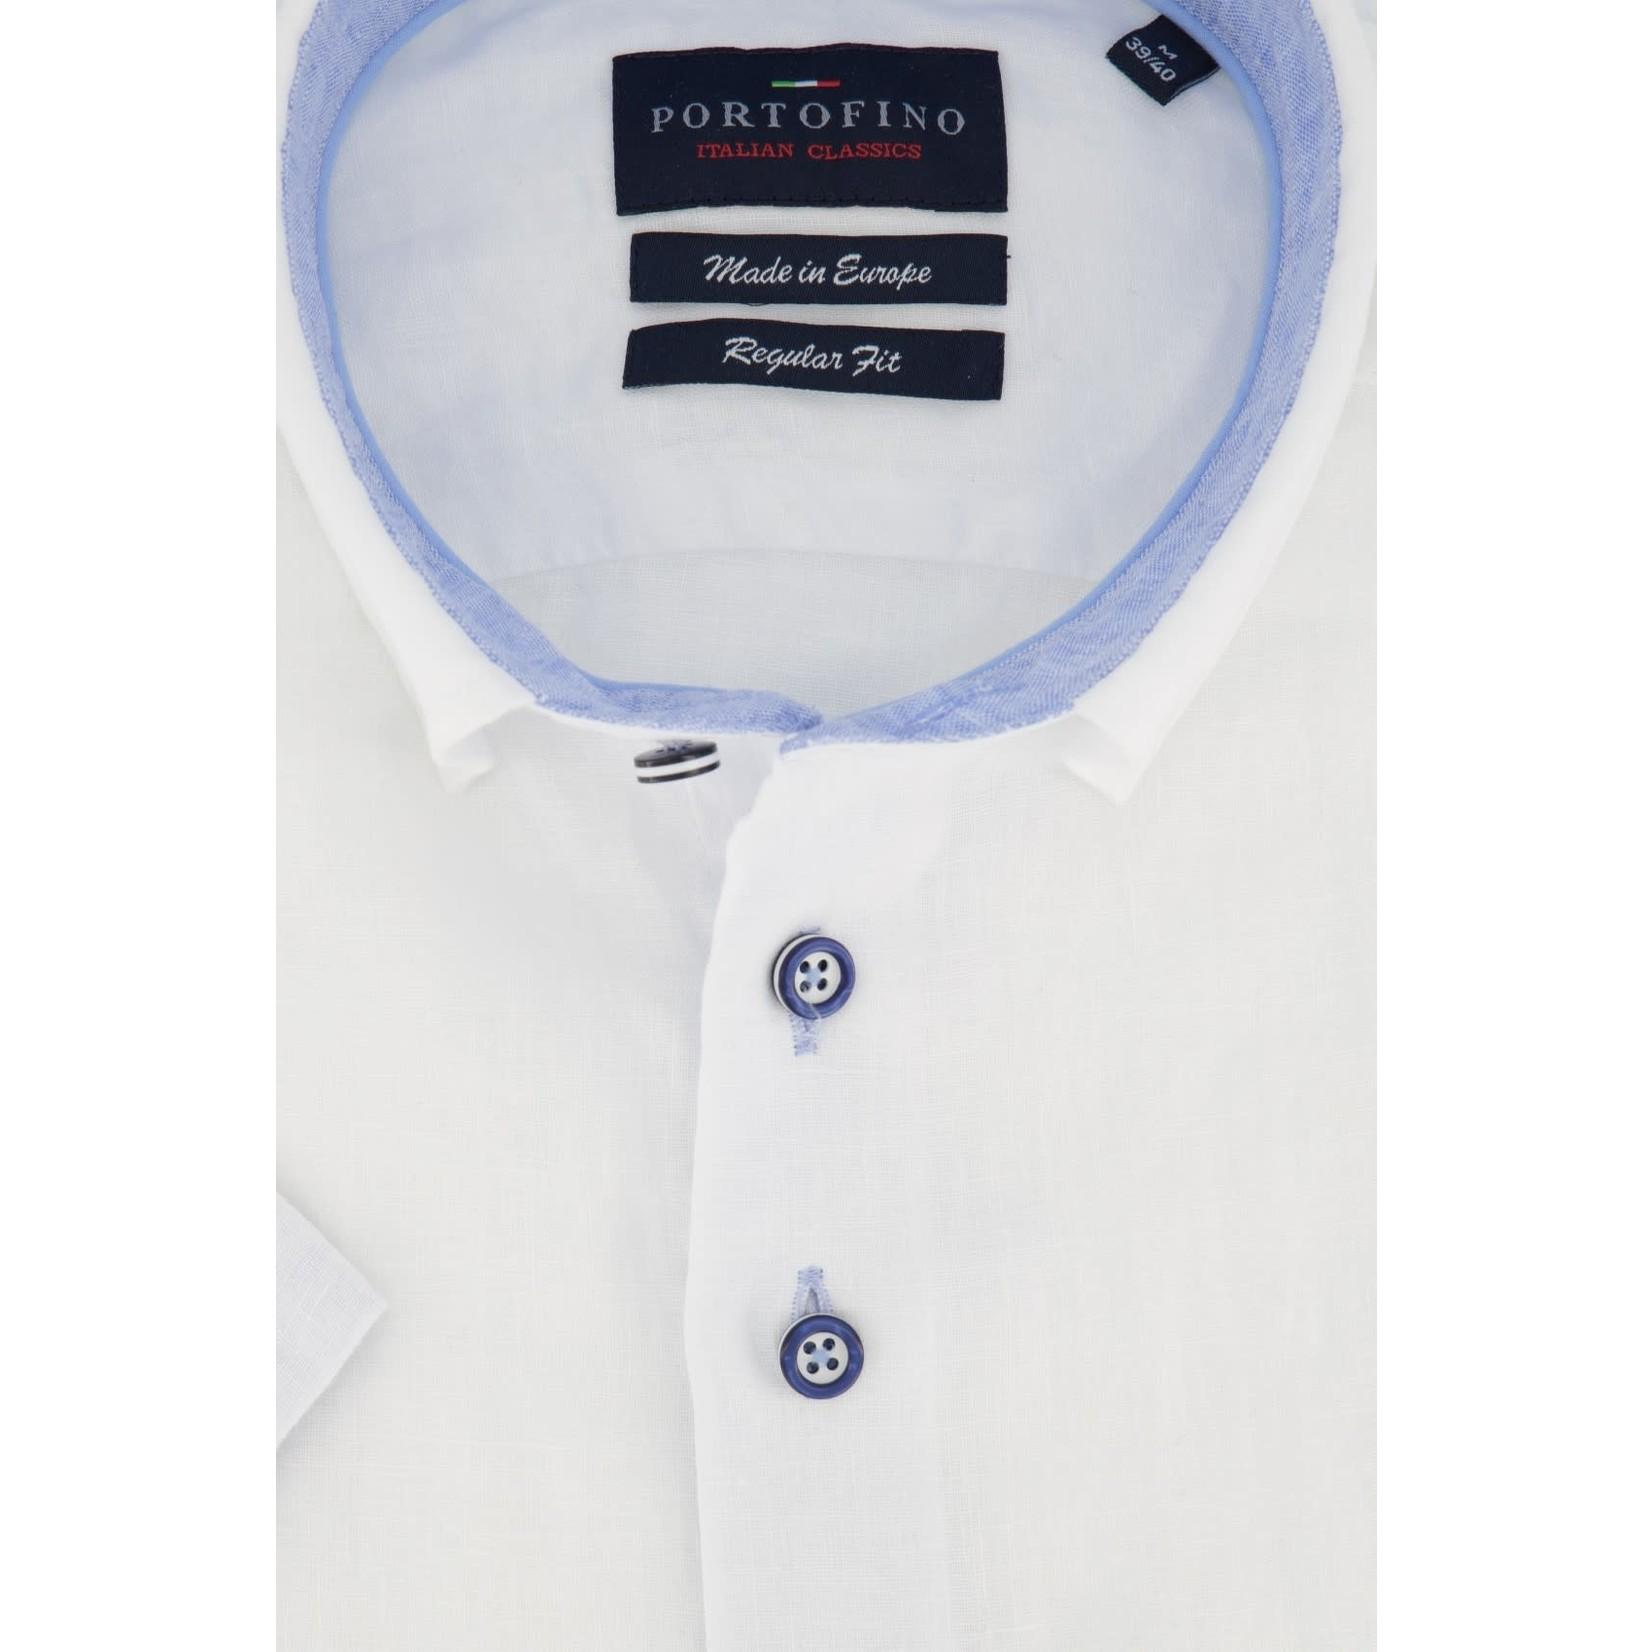 Portofino korte mouw overhemd regular fit wit